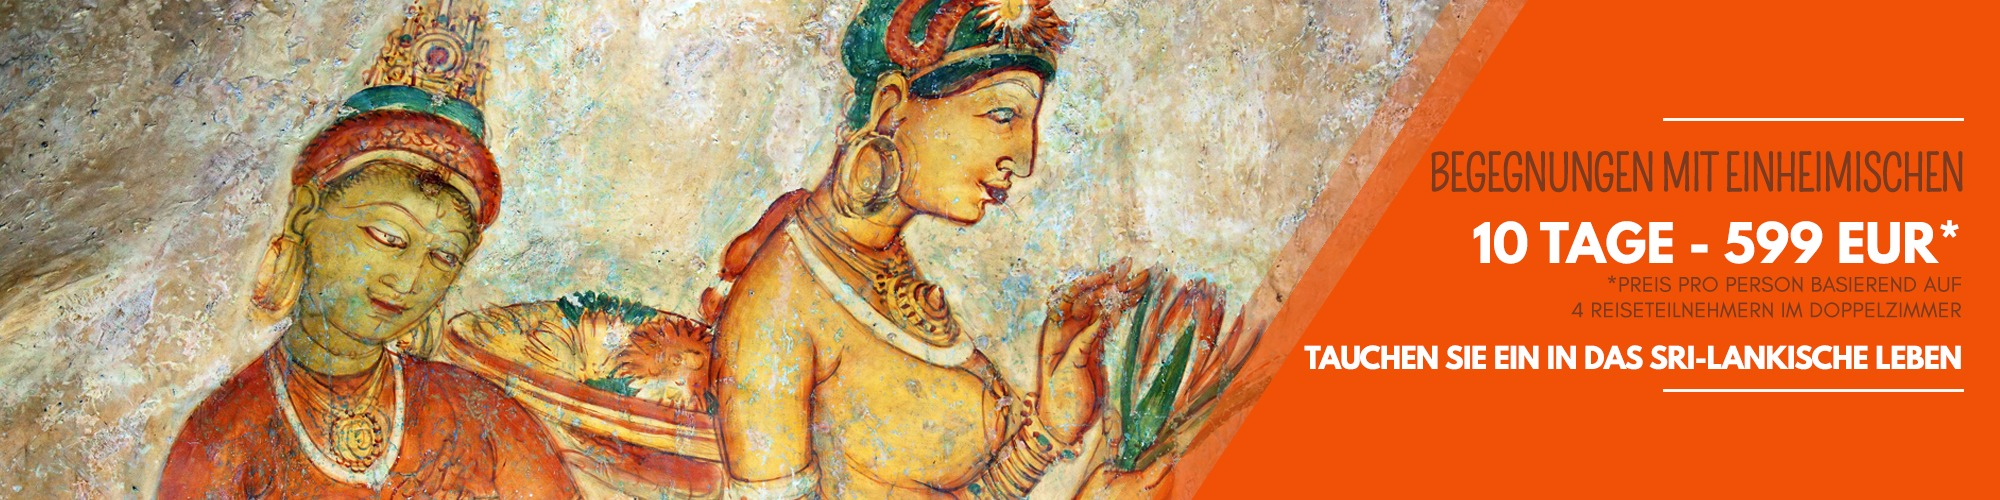 Sri Lanka Kultur: Die Hauptattraktionen im Kulturdreieck